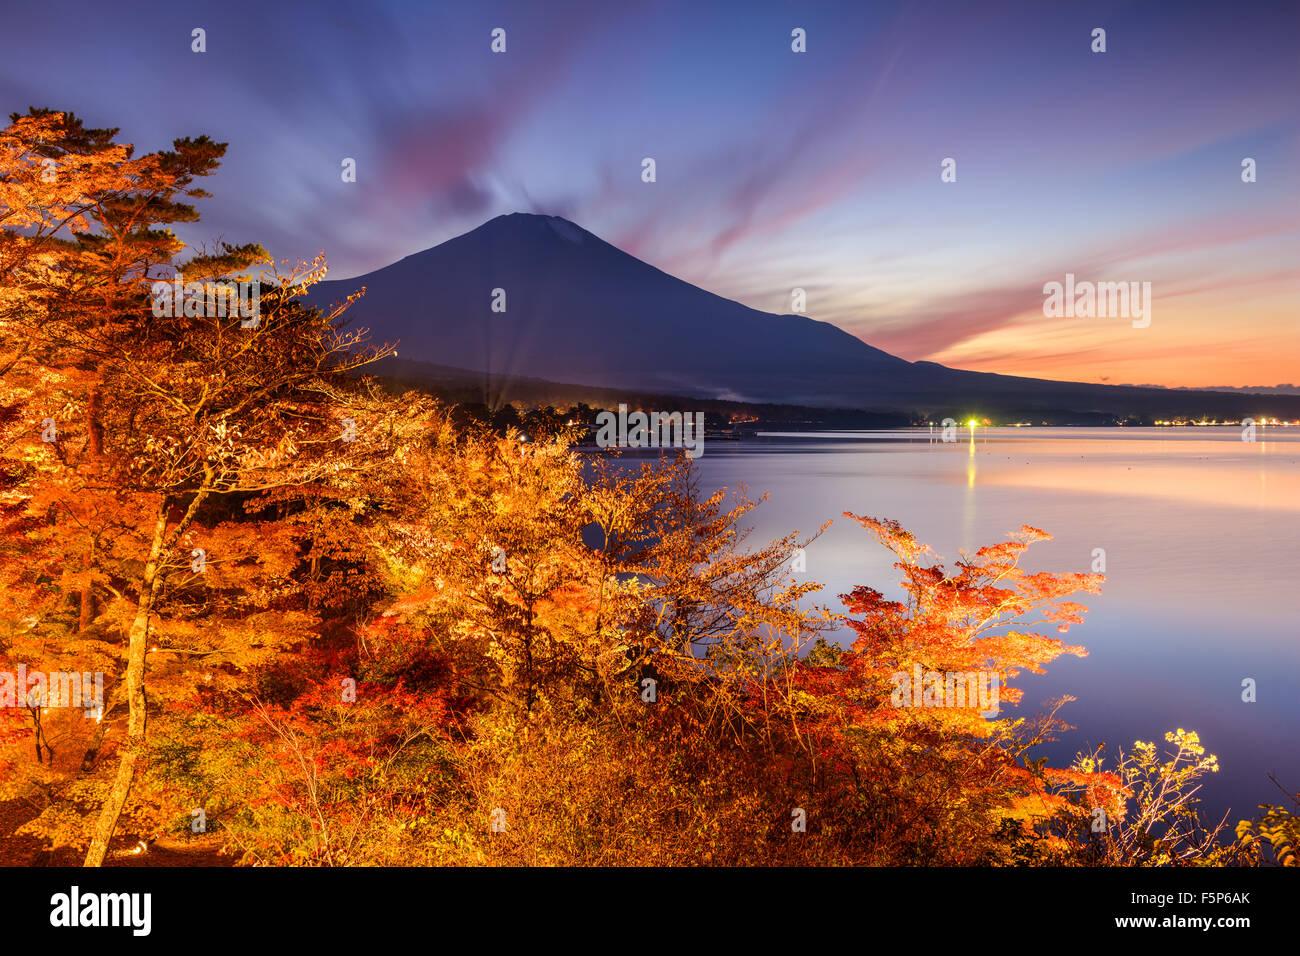 Berg Fuji, Japan vom Yamanaka-See im Herbst. Stockfoto